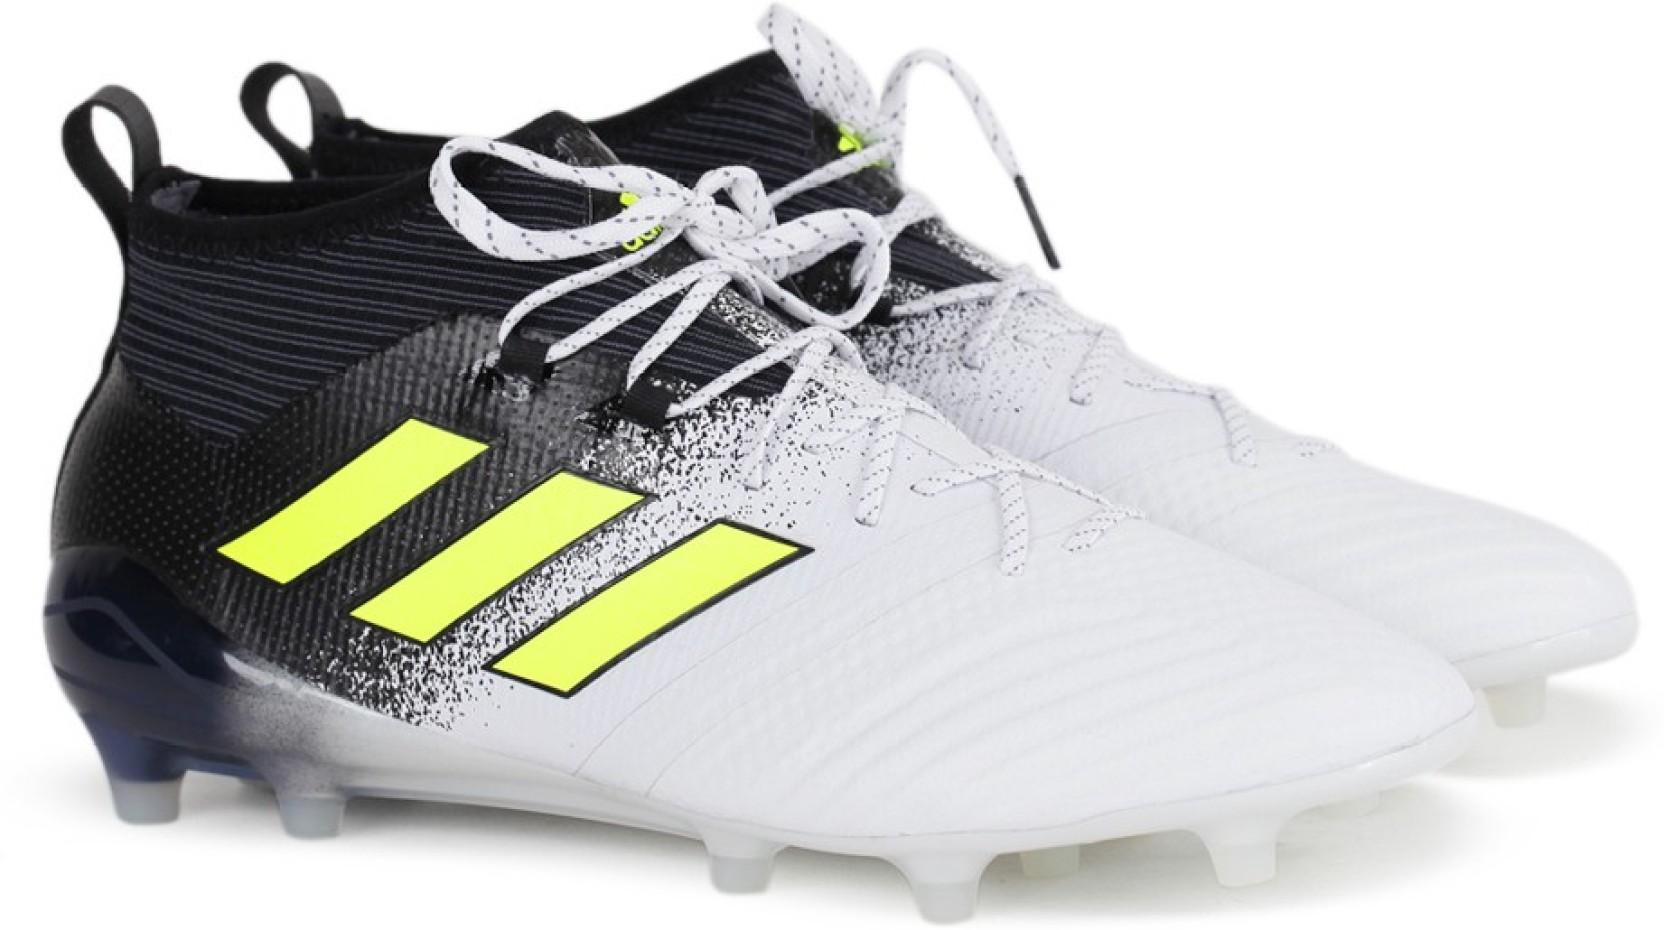 e09e1d11a7e ADIDAS ACE 17.1 FG Football Shoes For Men - Buy FTWWHT SYELLO CBLACK ...